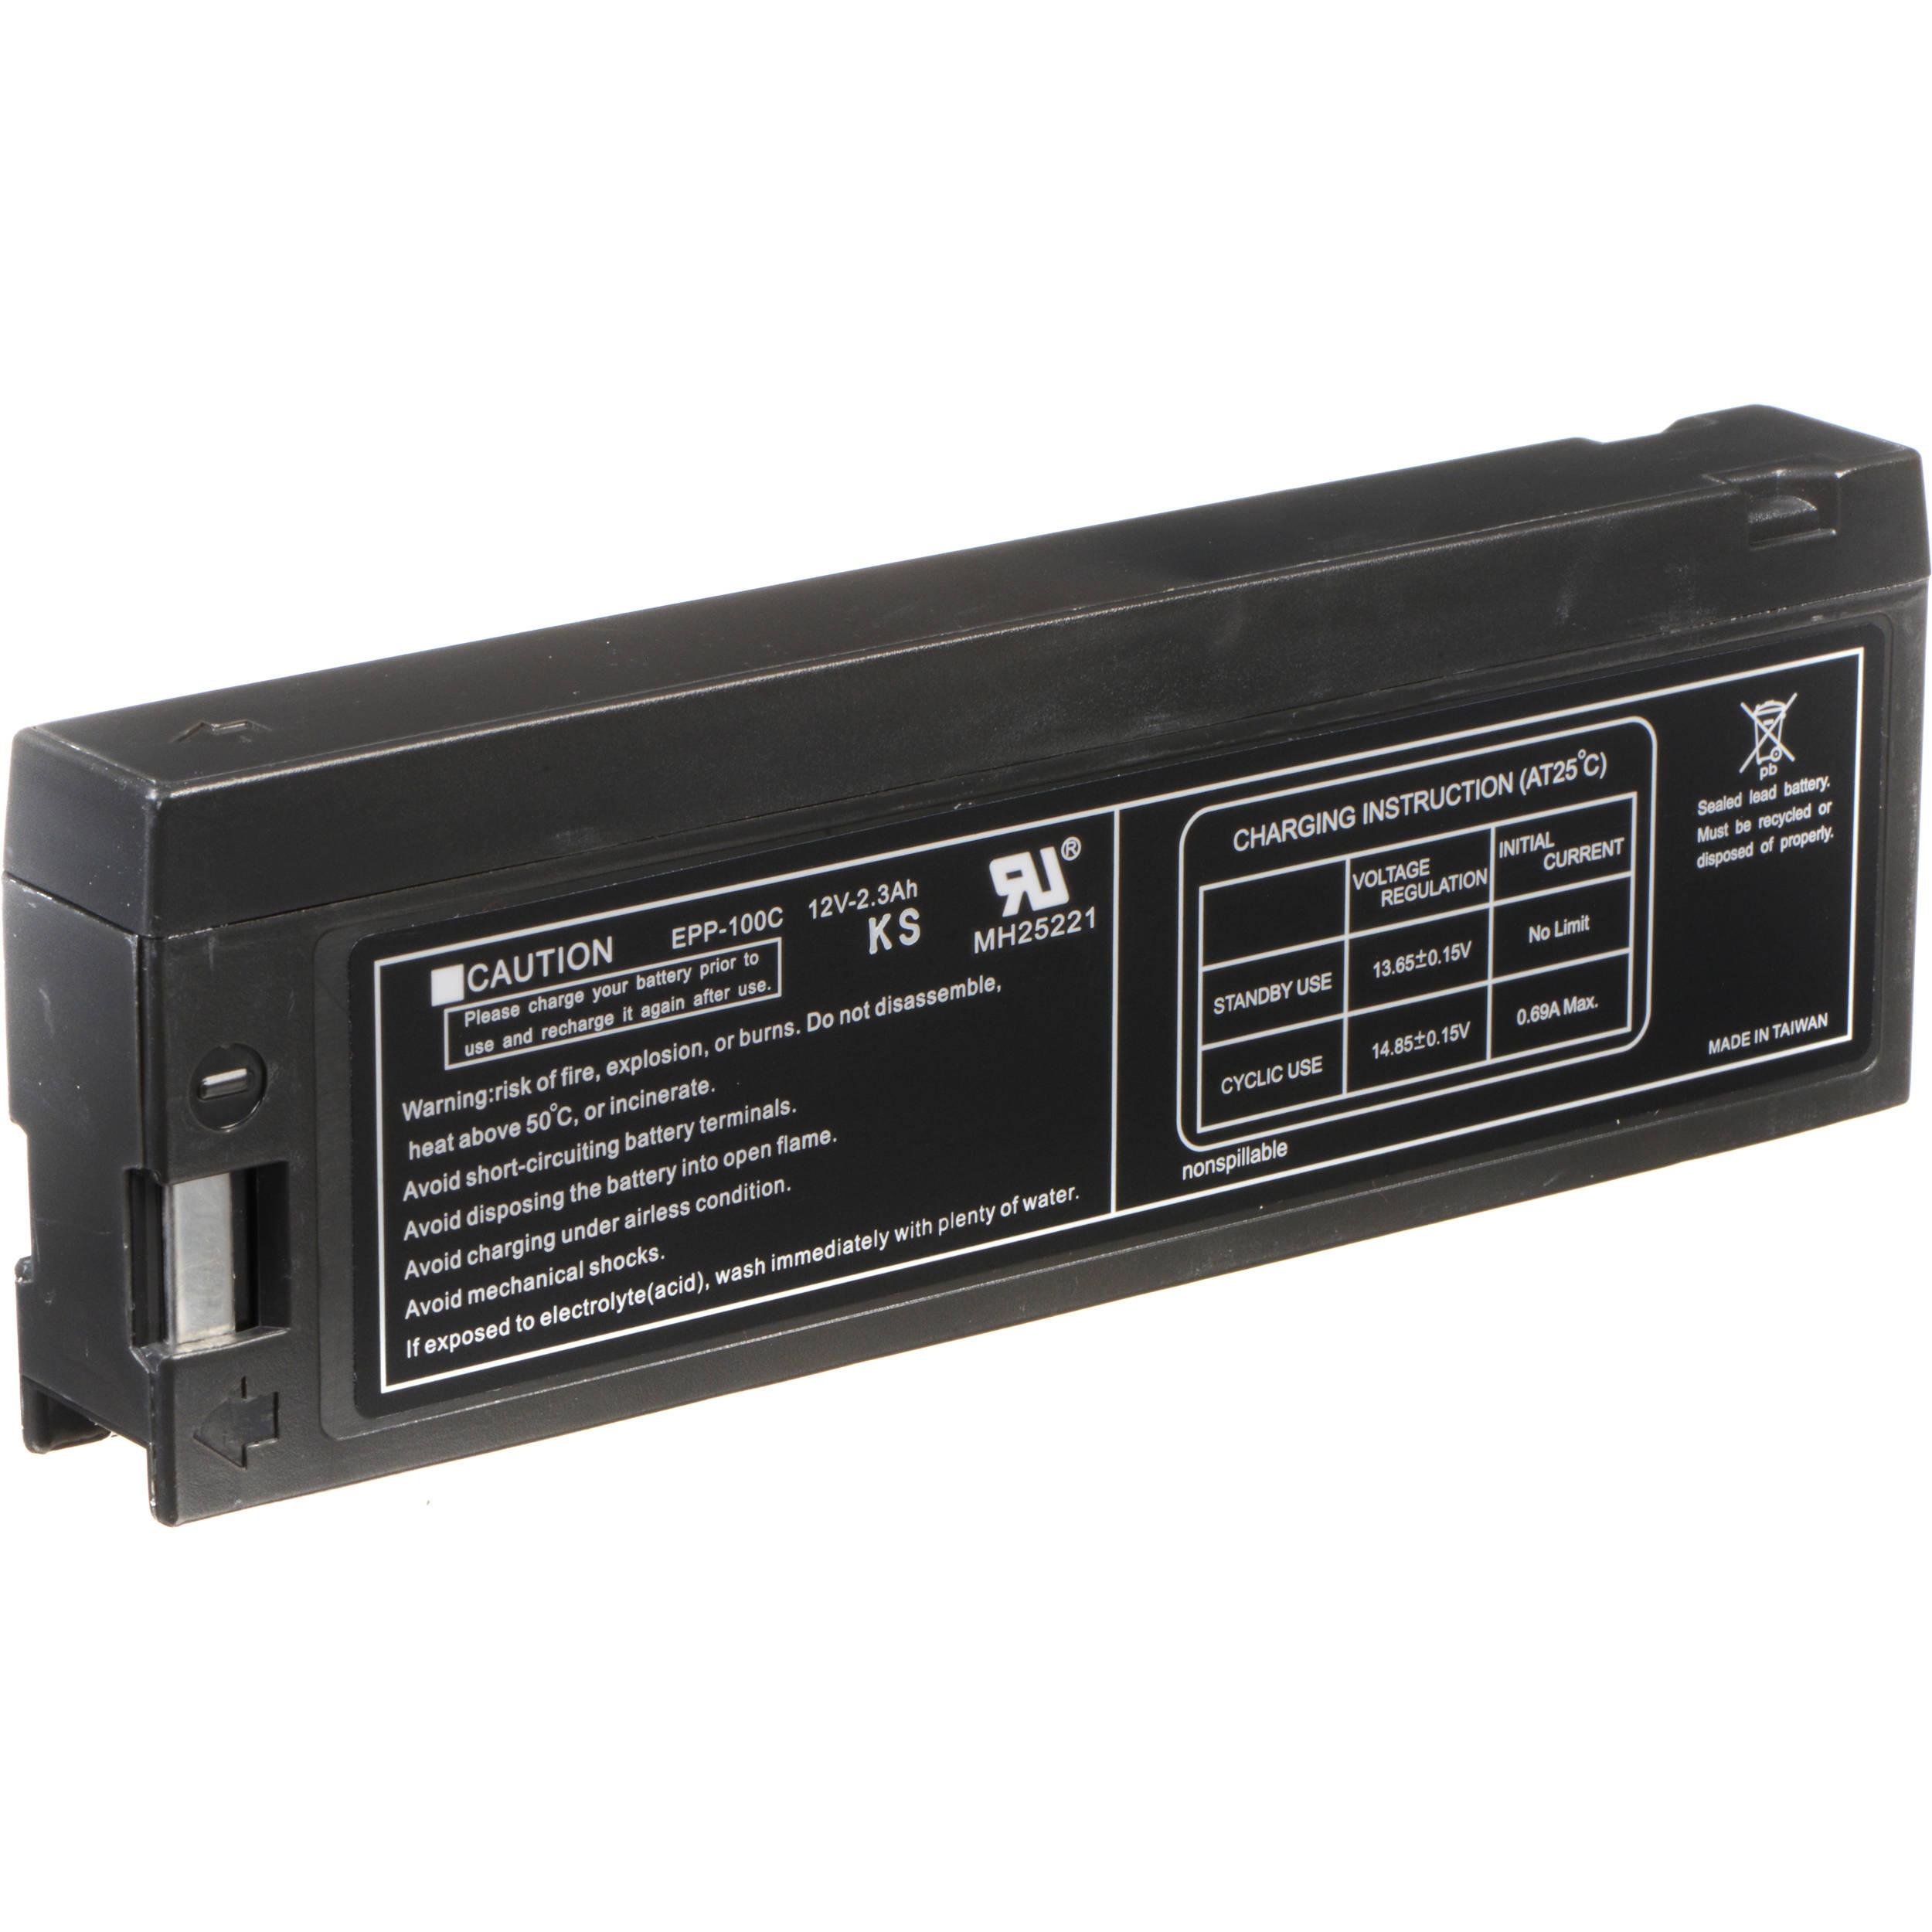 Bescor Pv Bp88 Lead Acid Battery Pack 12v 2300mah Pvbp88a1h